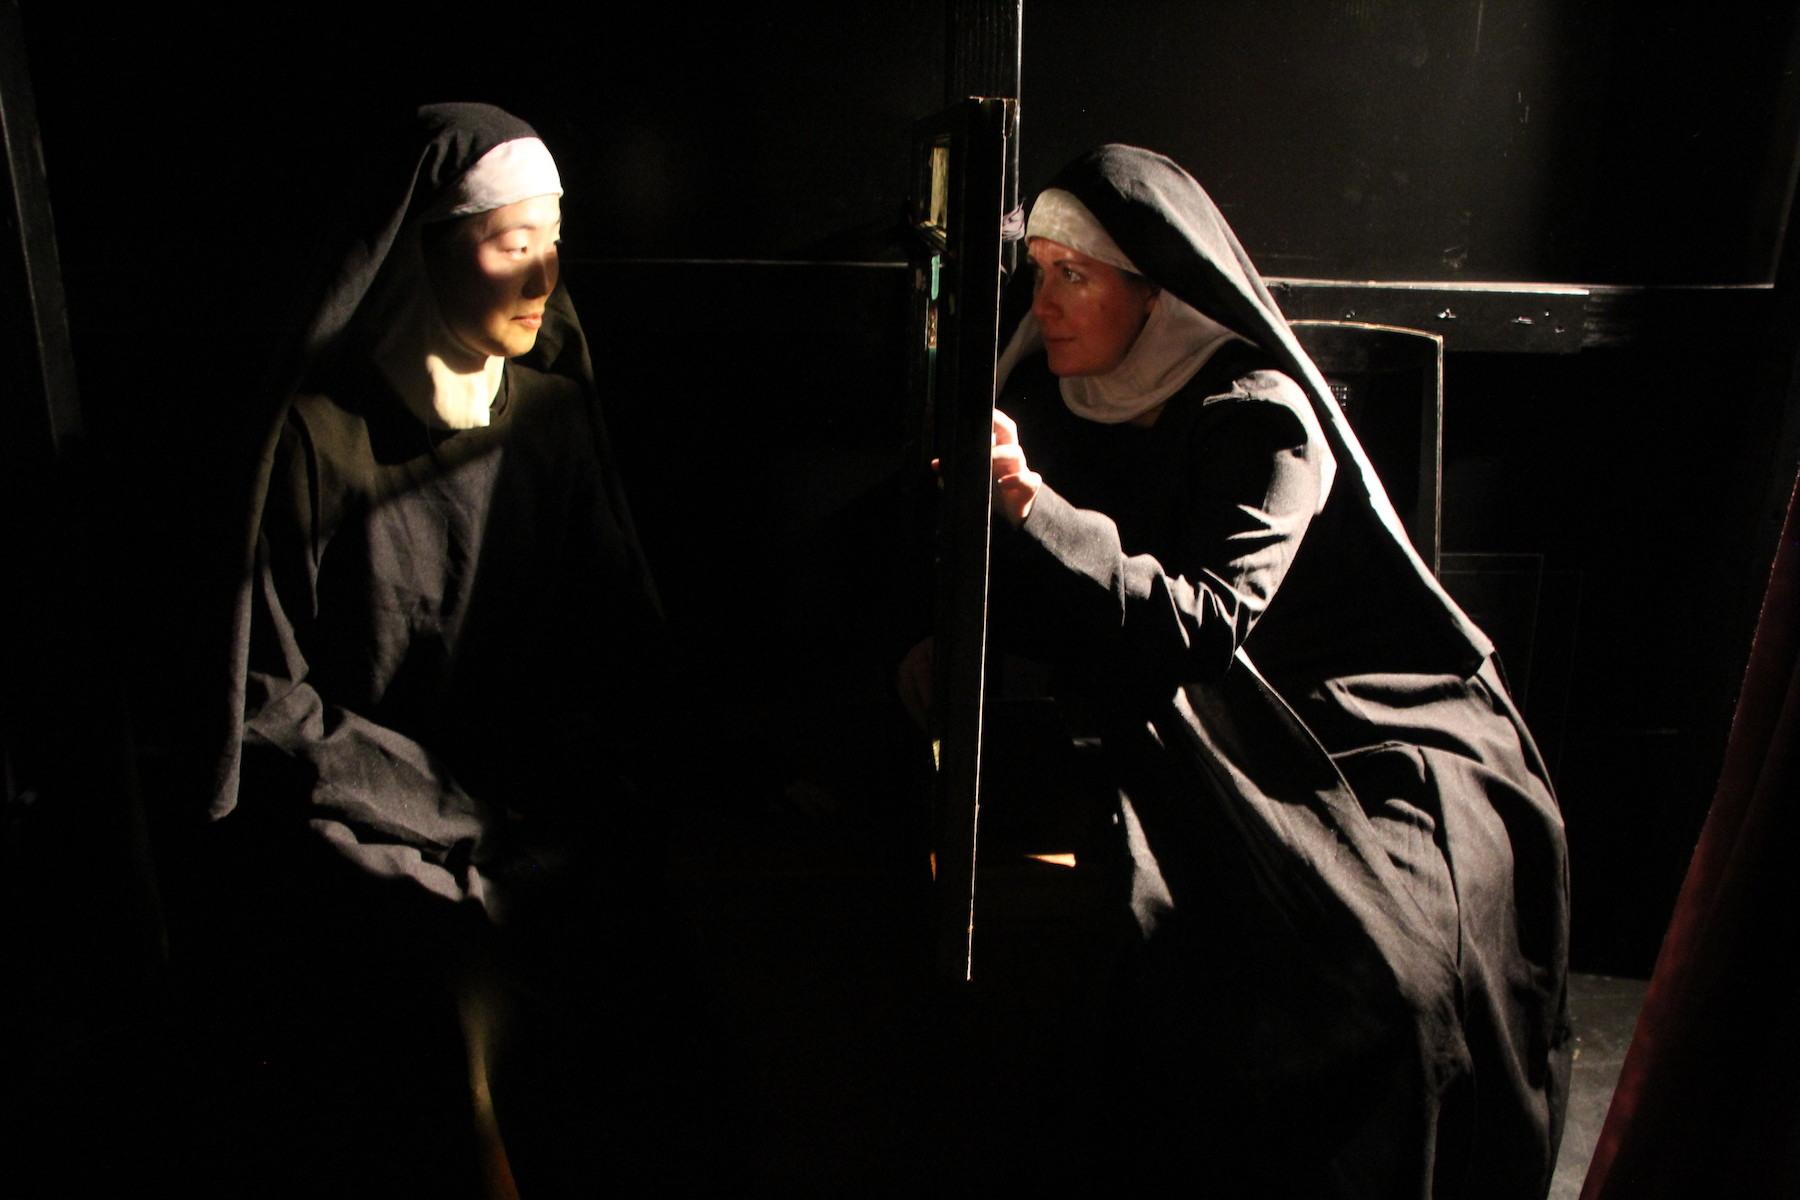 Two nuns talk in Luna Eclipse